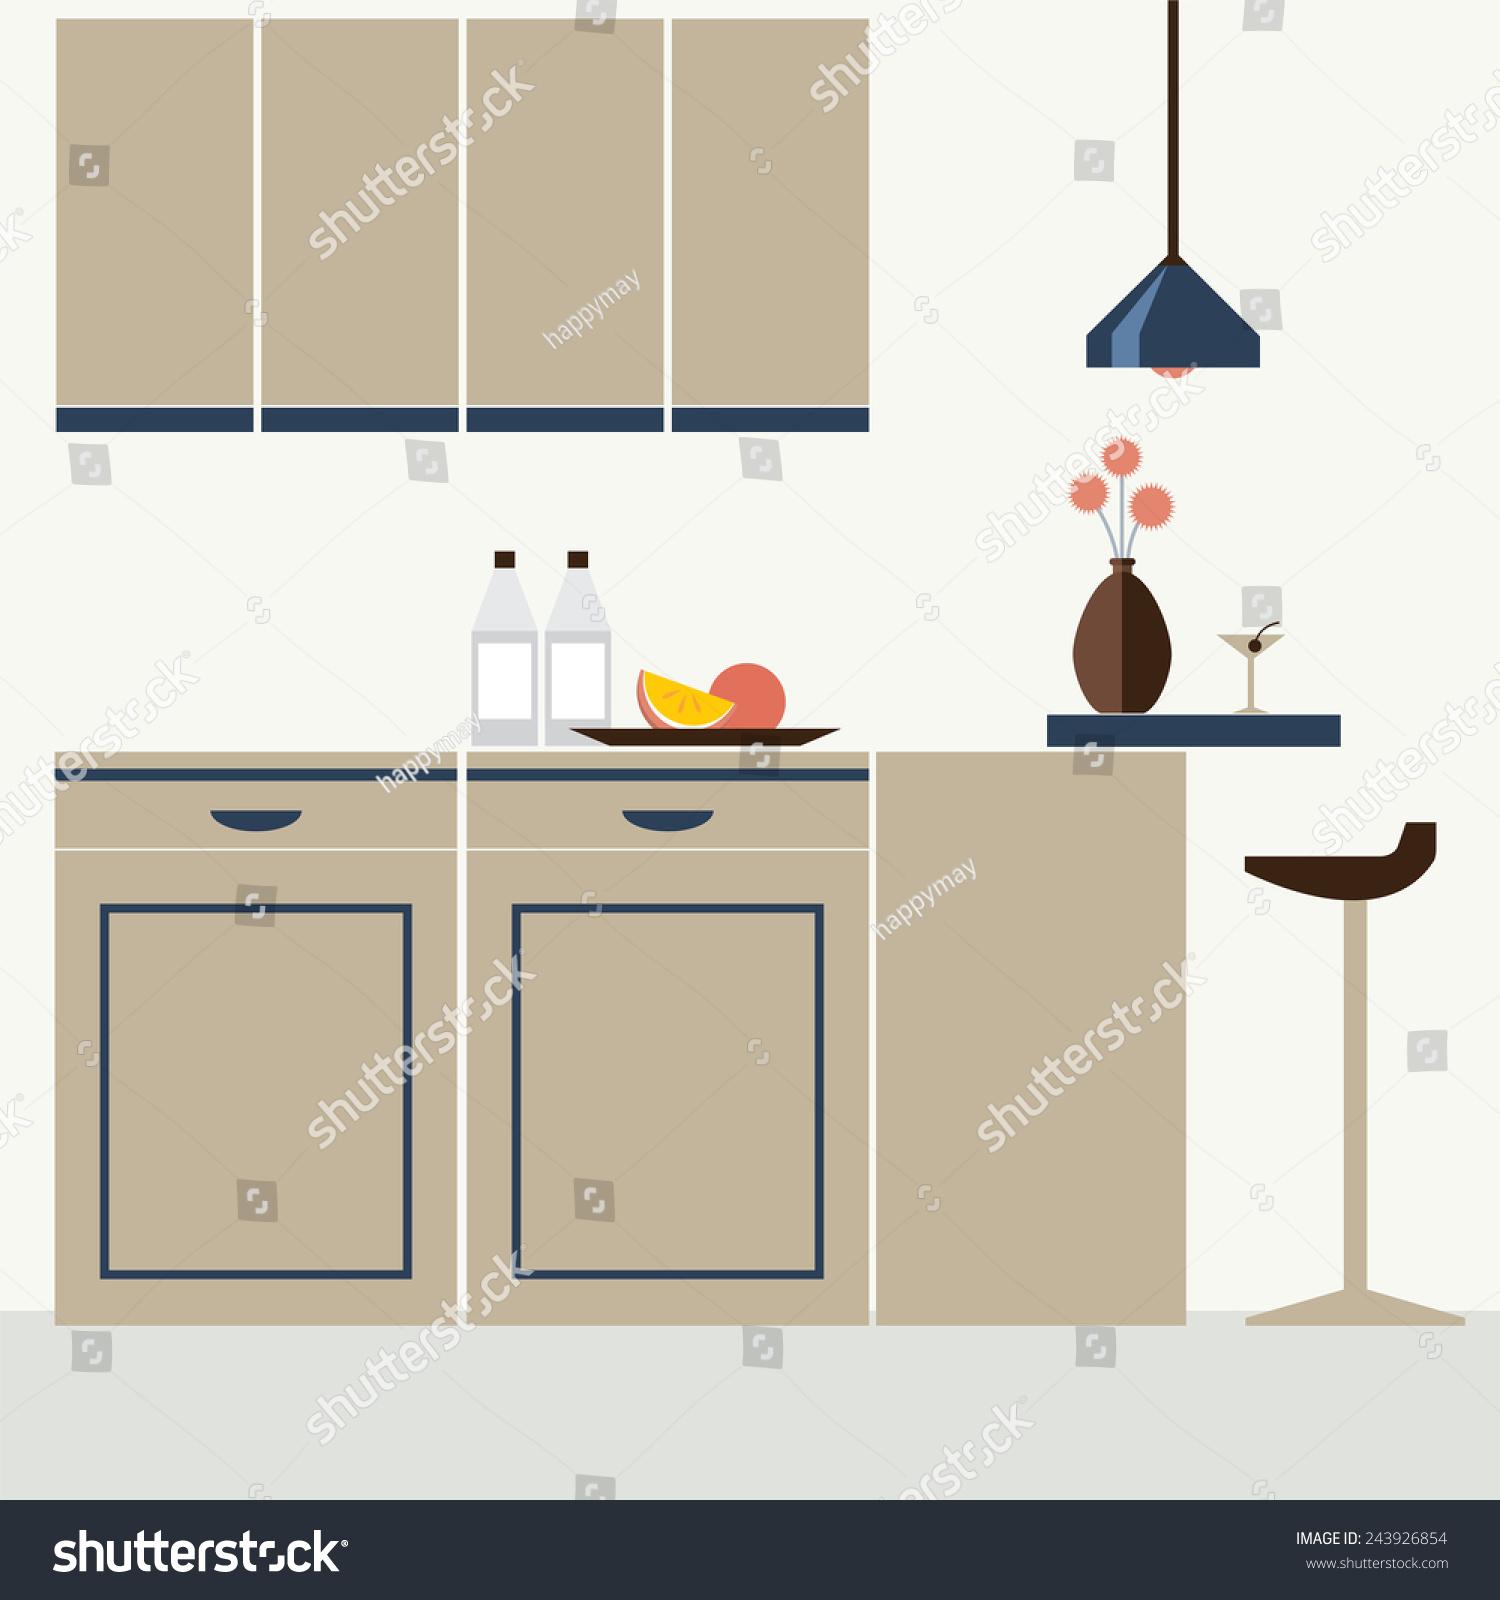 Modern Flat Design Kitchen Interior Vector Illustration 243926854 Shutterstock